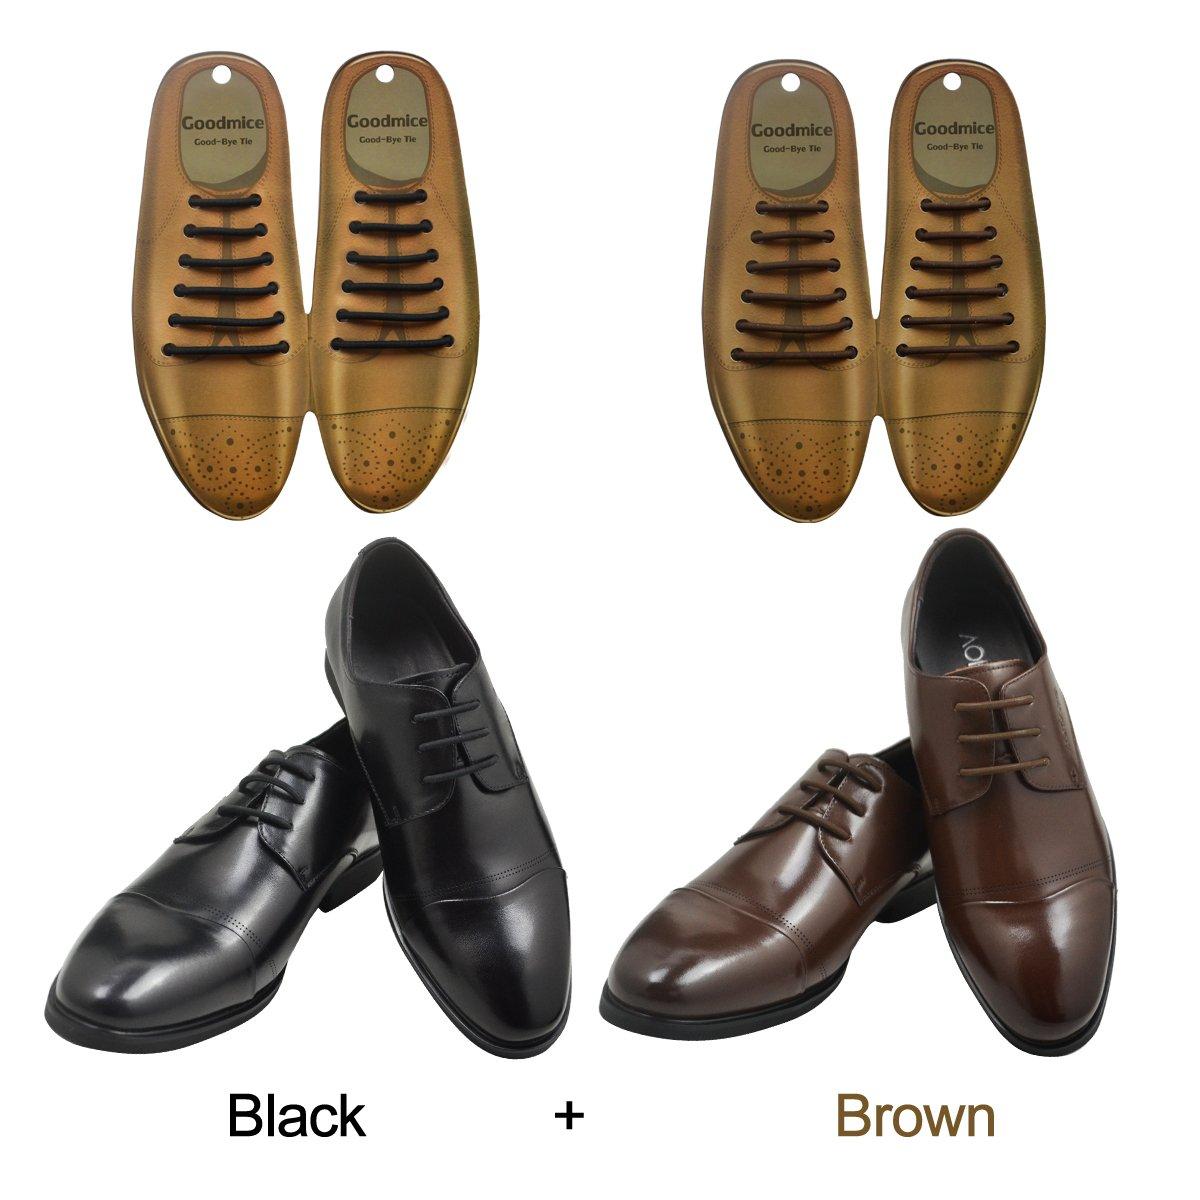 SENT CHARM No Tie Dress Shoe Laces for Men/Women Elastic Rubber Silicone Formal Oxford Shoelaces Best for Dress Shoes Oxford Shoes (Black+Brown)